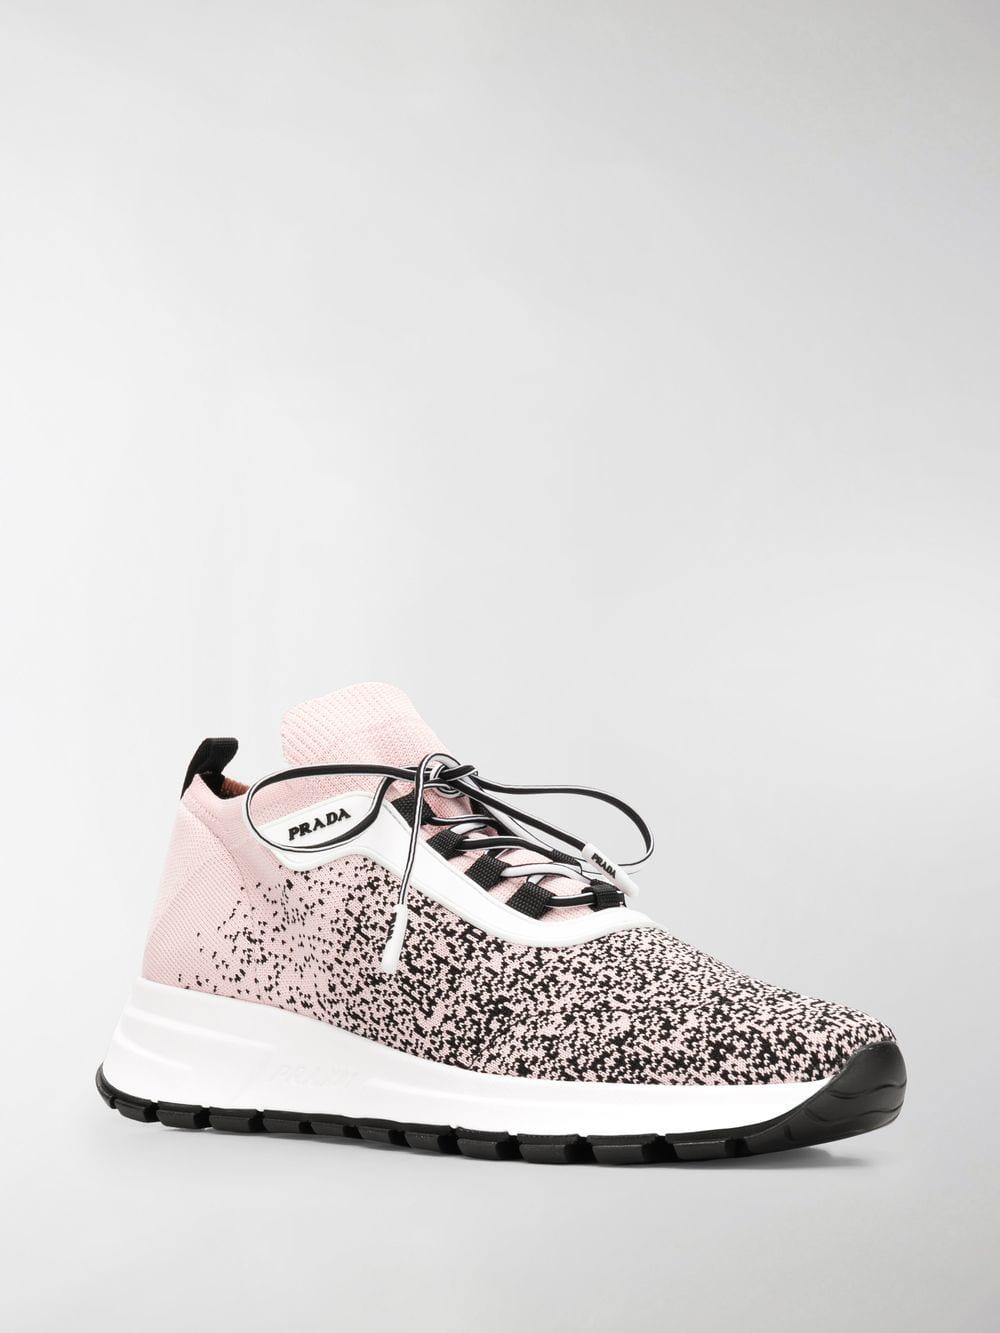 522f22e5f66 Prada Sock Lace-up Sneakers in White - Lyst